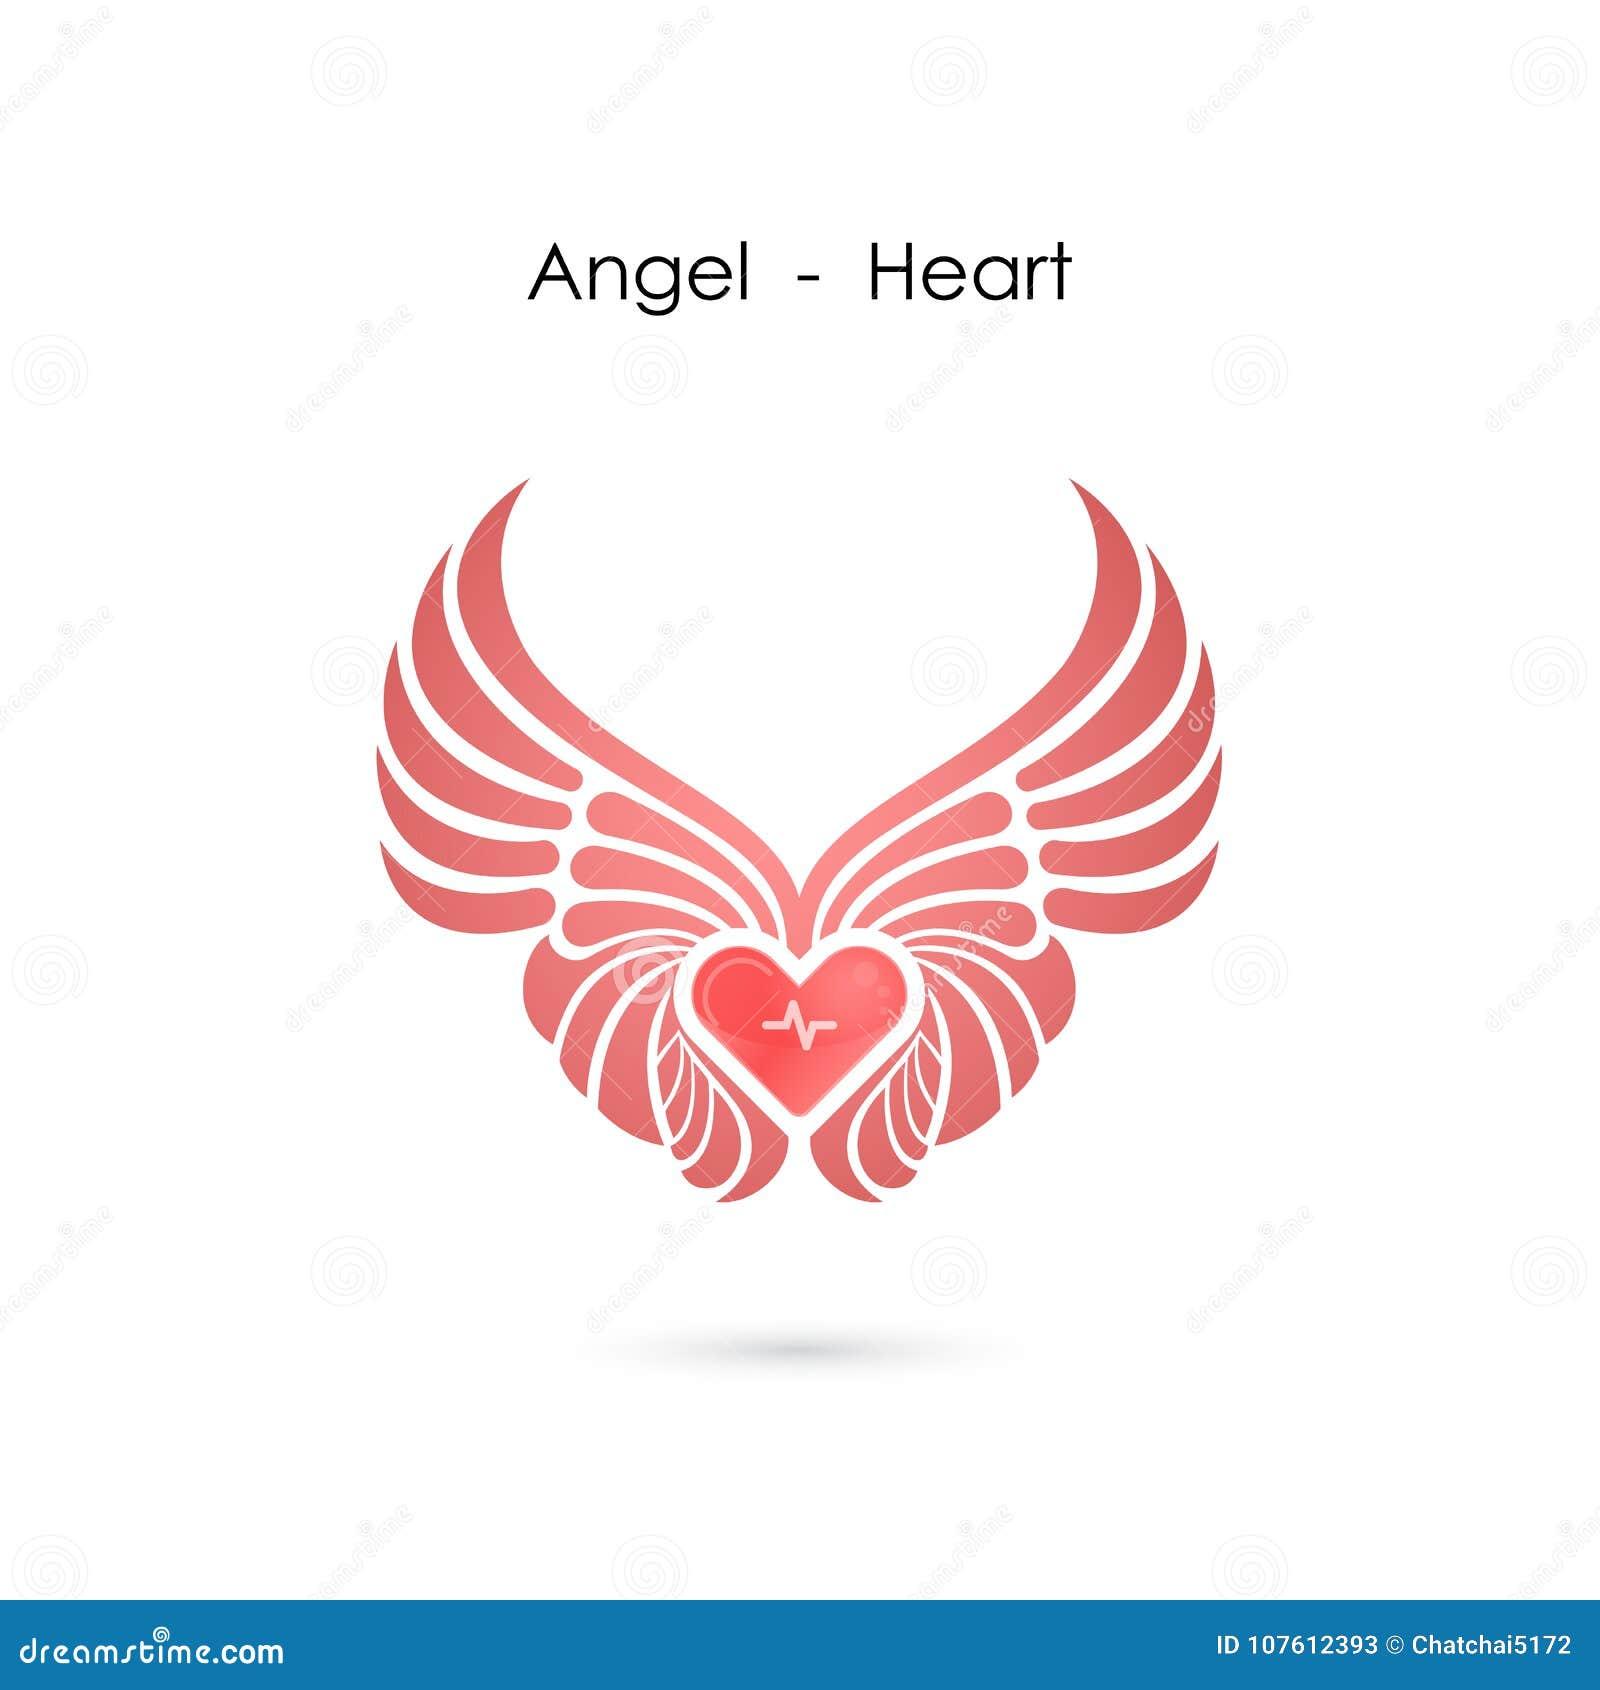 Heart Logo With Angel Wings Logo Design Templatelove Symboll